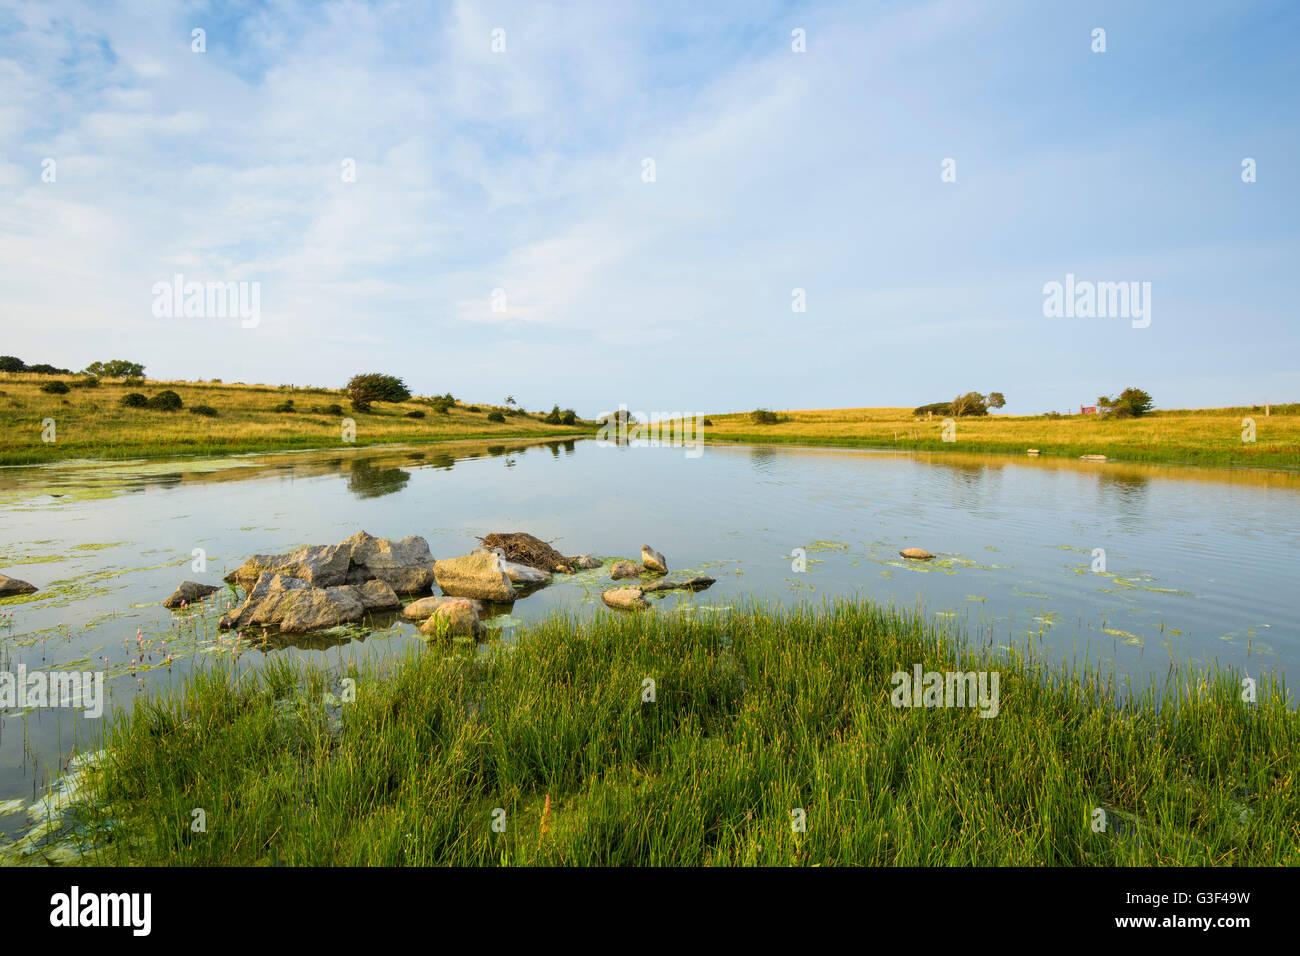 Inland Lake in Summer, Fyns Hoved, Hindsholm, Kerteminde, Funen, Baltic Sea, Denmark Stock Photo